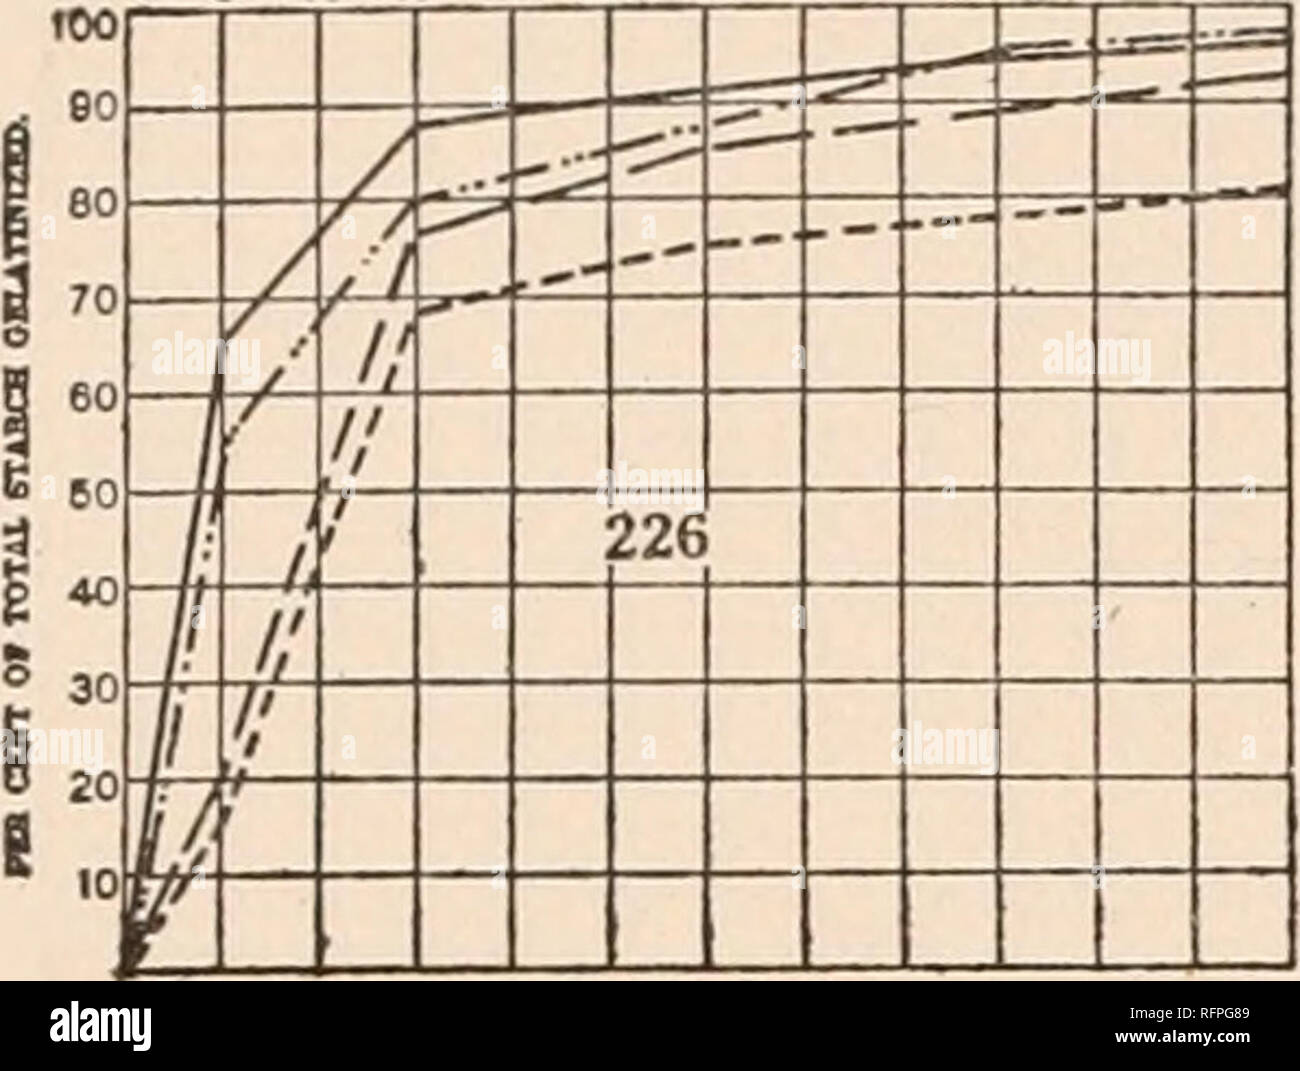 Carnegie Institution of Washington publication  226 or tzAcnoir n